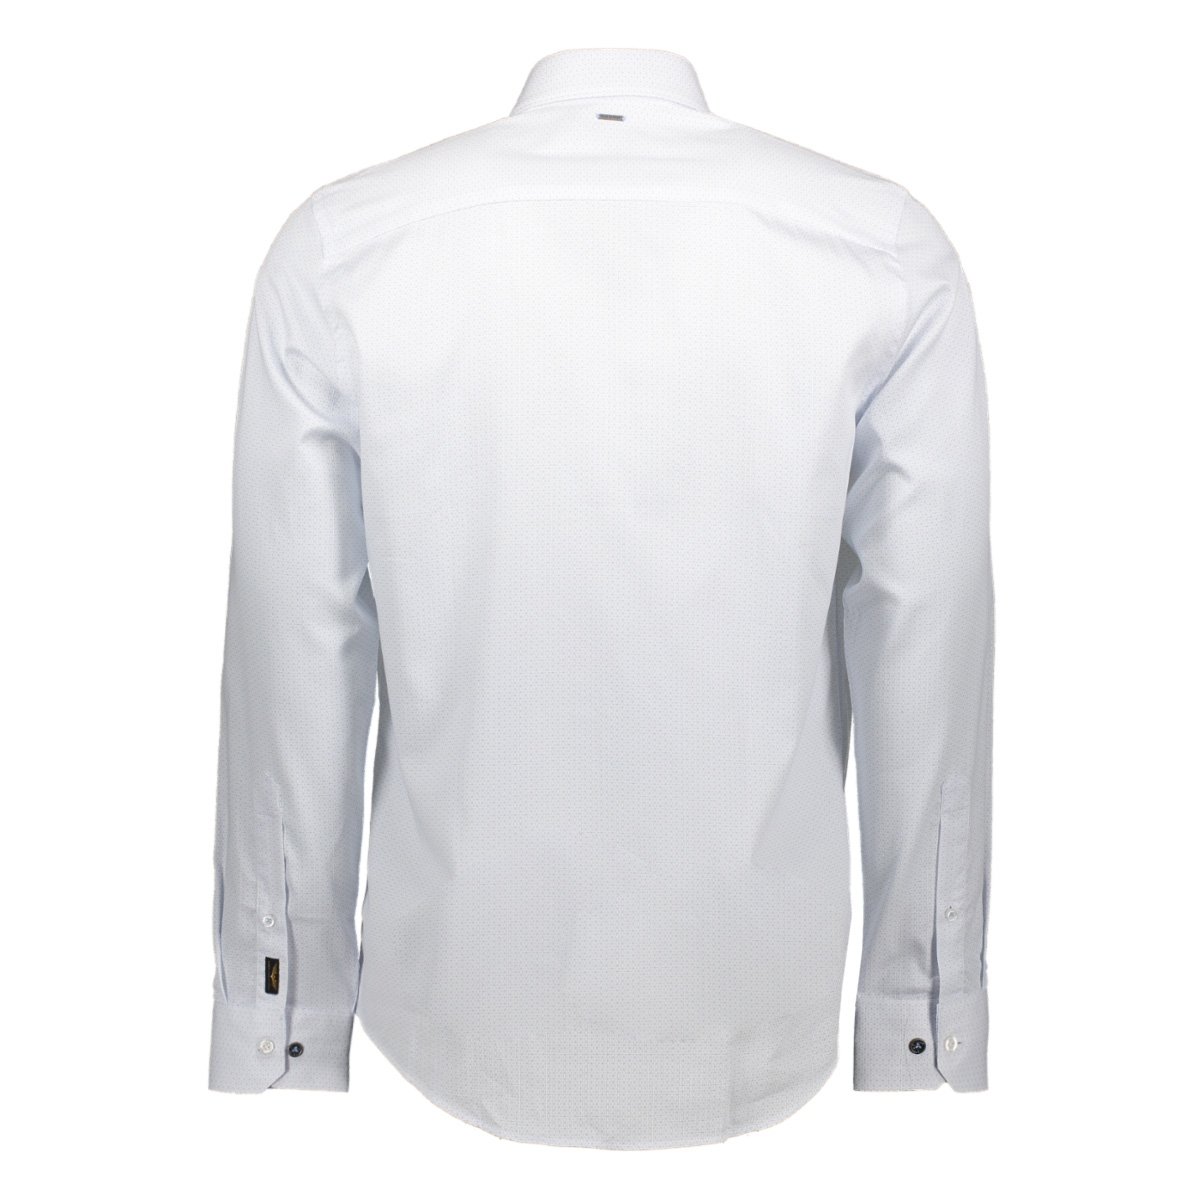 psi191252 pme legend overhemd 7003